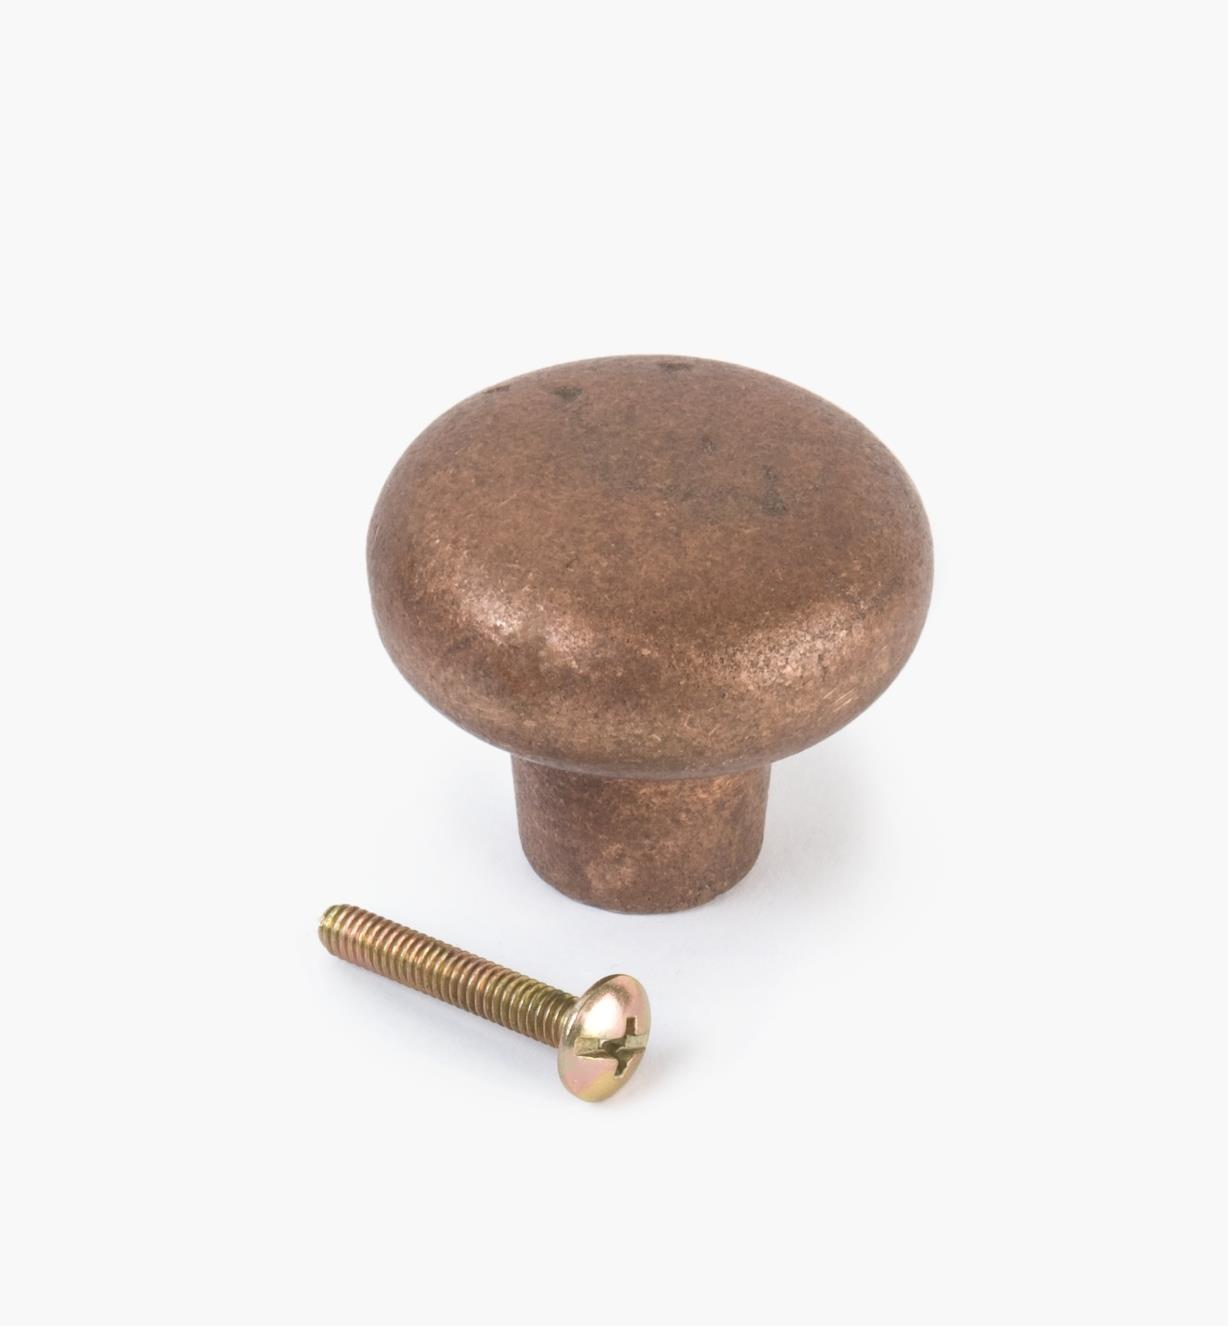 02G0324 - Bouton bombé de 15/8po x 13/8po, série Montana, fini bronze naturel